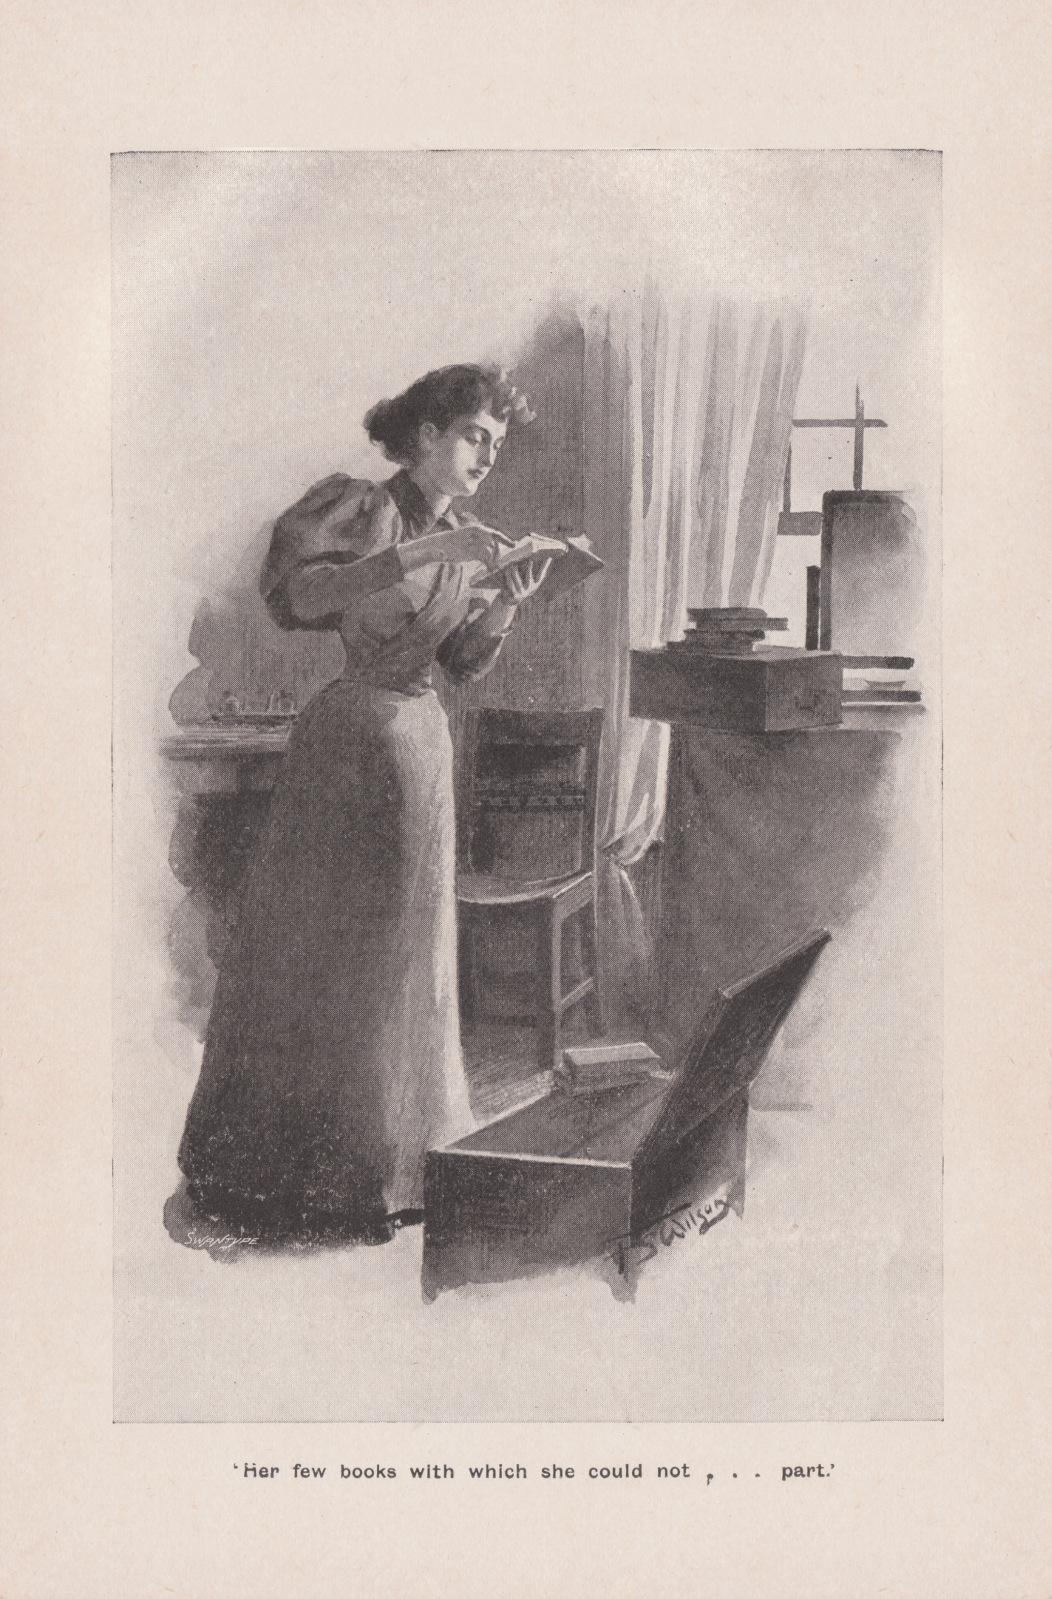 Herfewlondonlongmans1895215